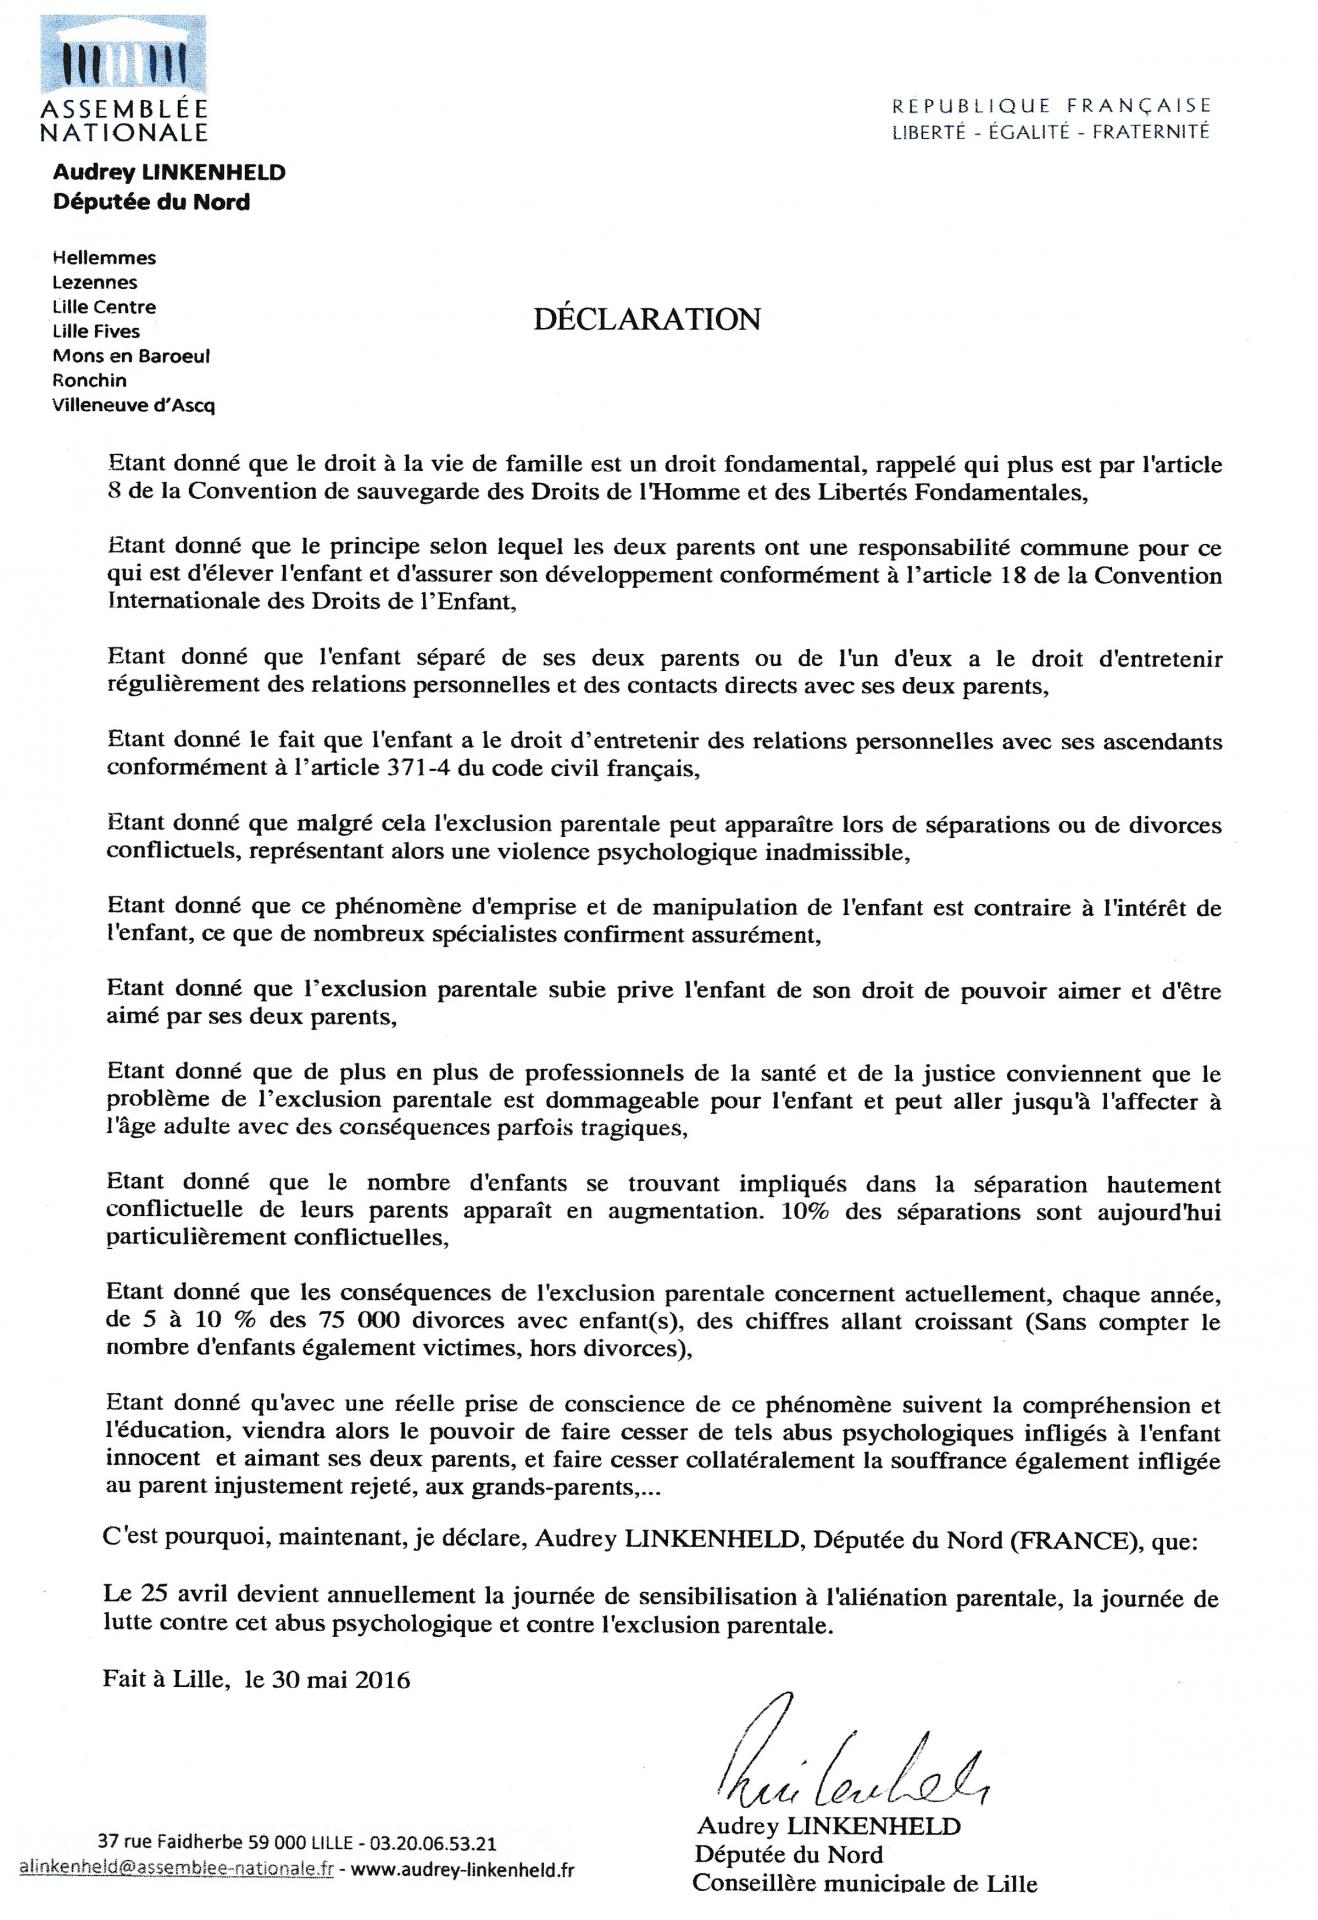 Declaration third parliament member france